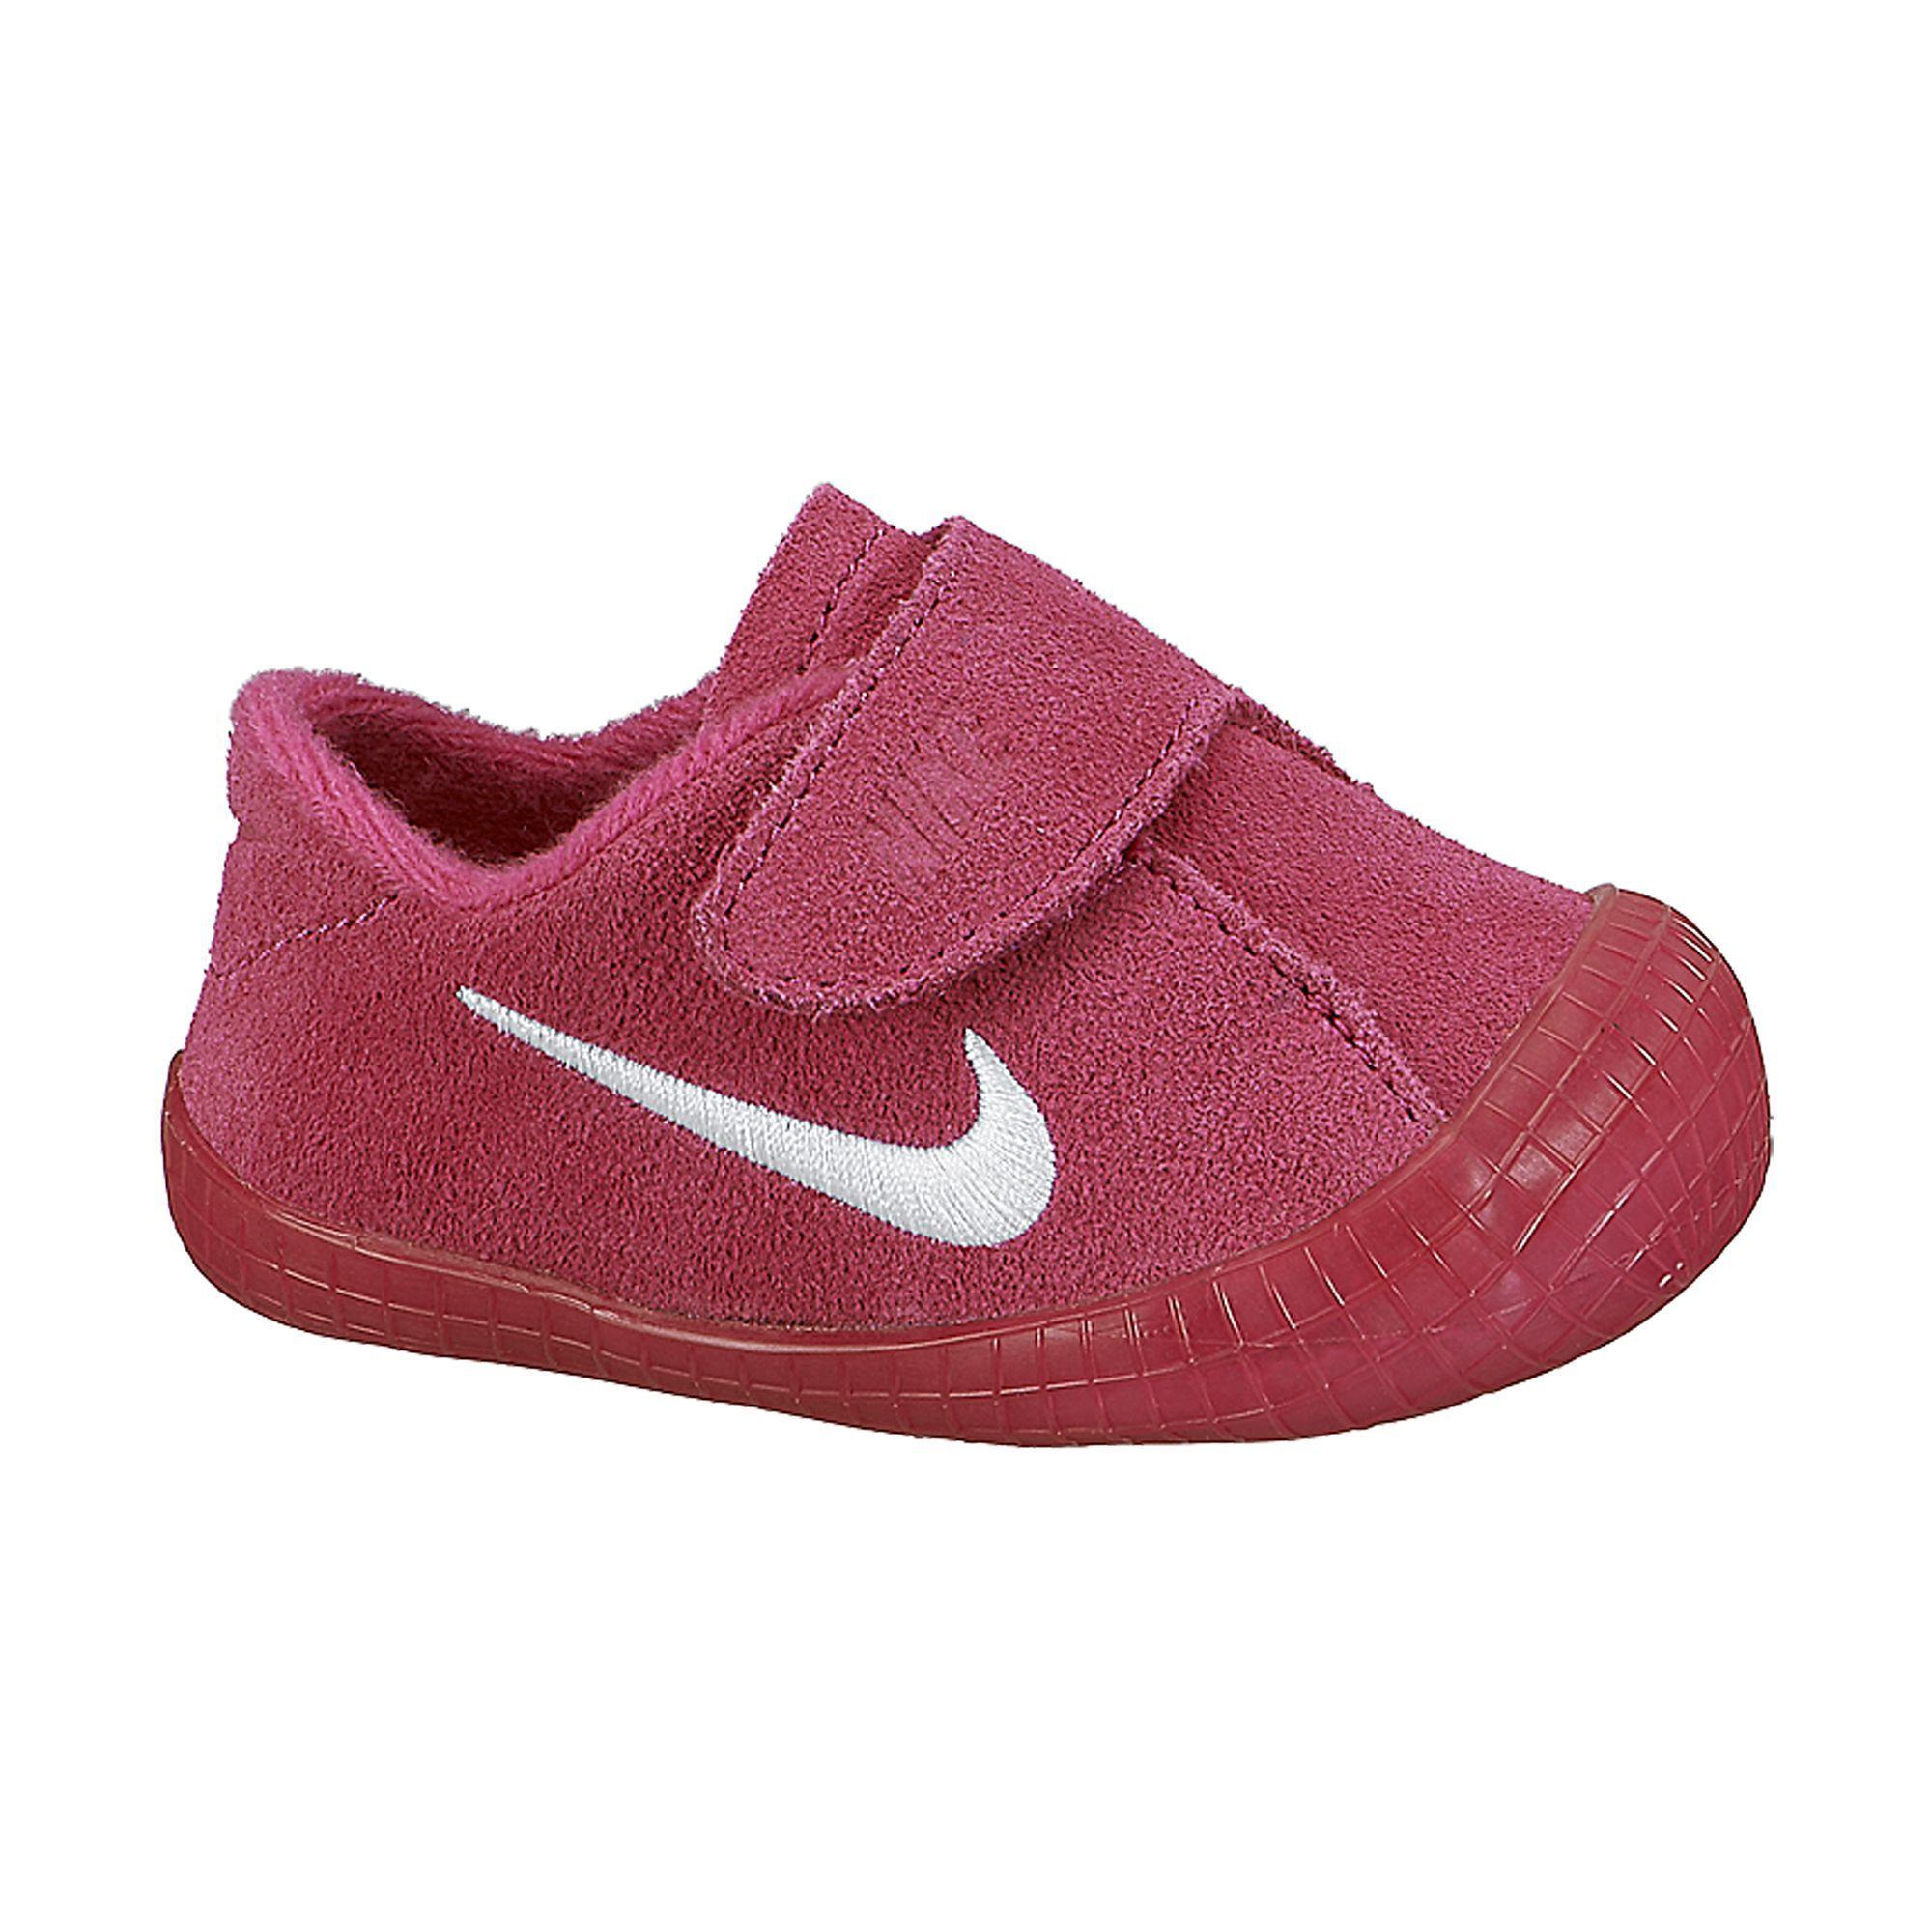 Nike Waffle babyschoenen (roze of blauw) voor €16,87 @ Aktiesport